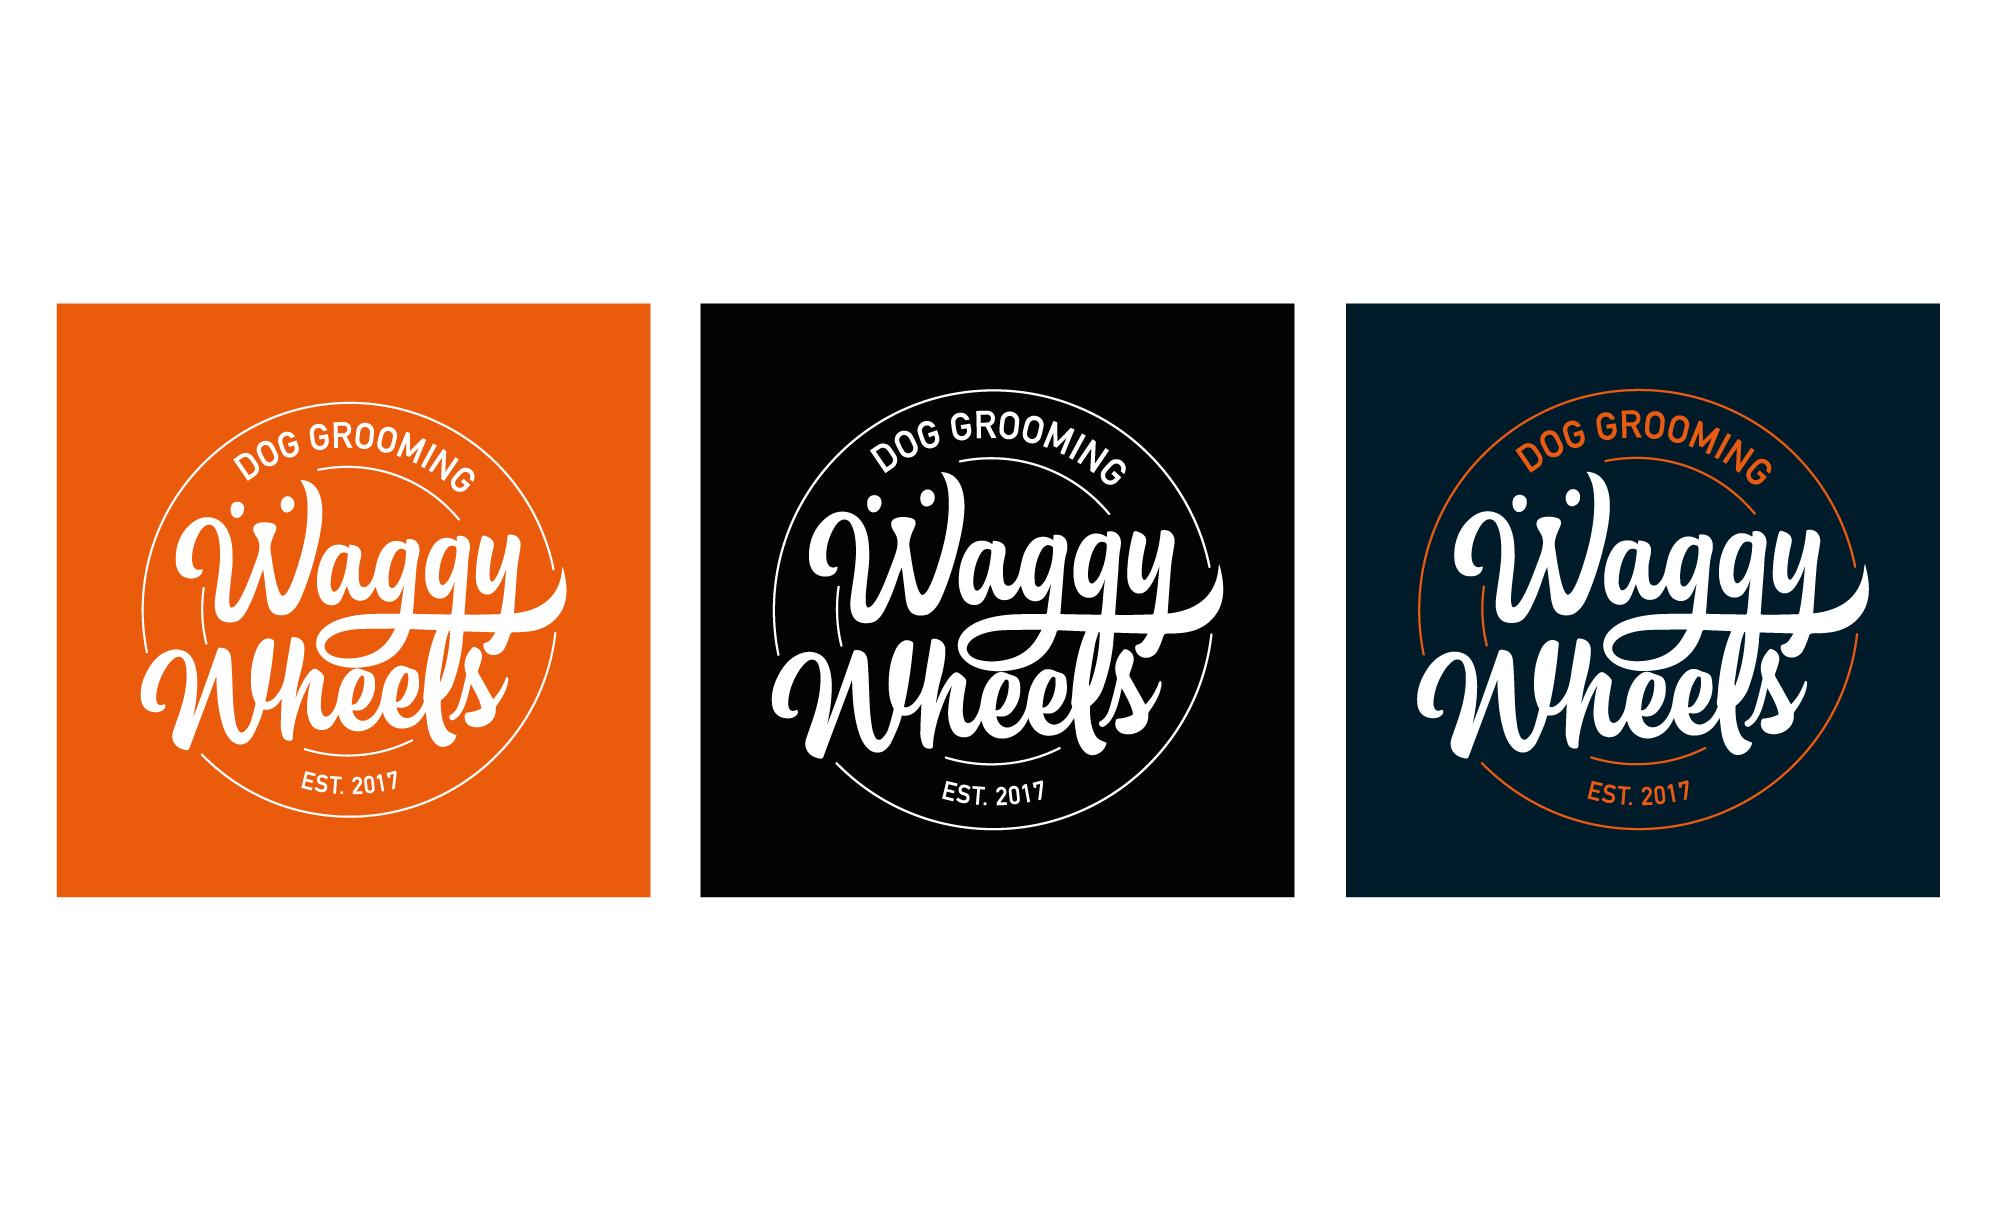 Waggy-Wheels-Portfolio_2_Logos2.jpg